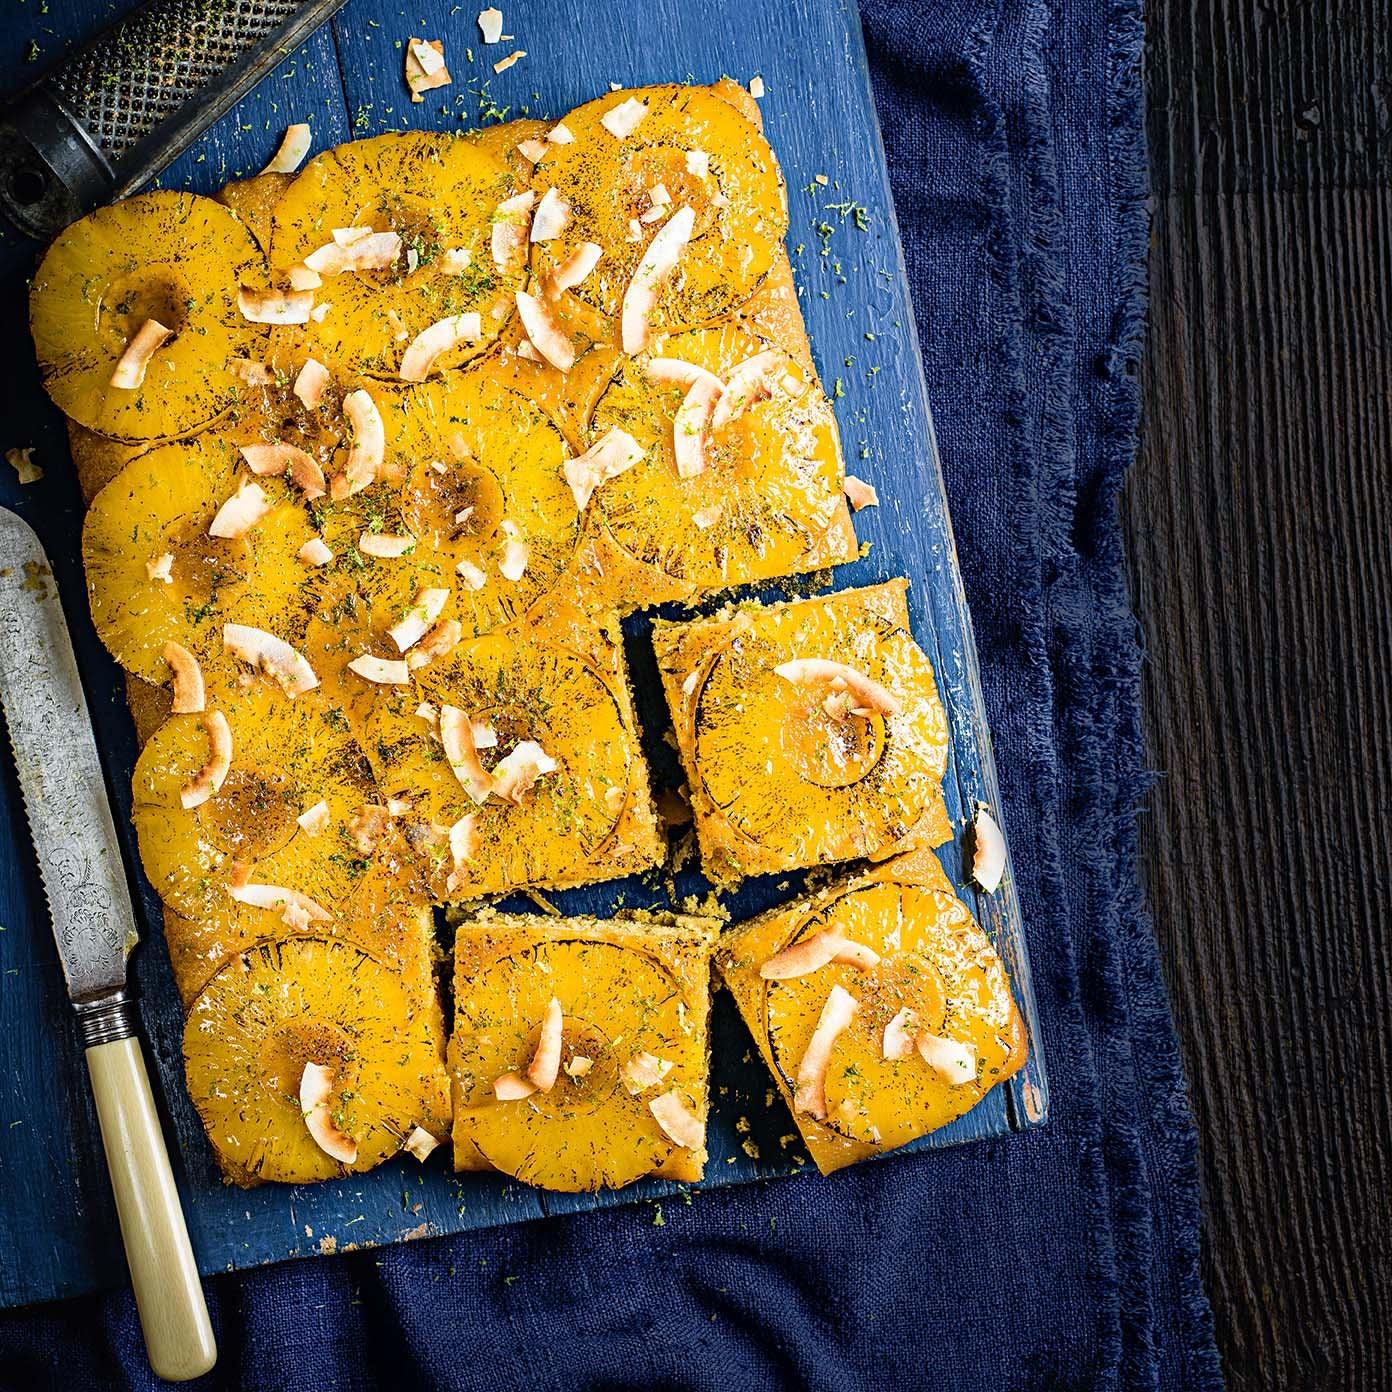 Photo of Piña colada pineapple upside-down cake by WW